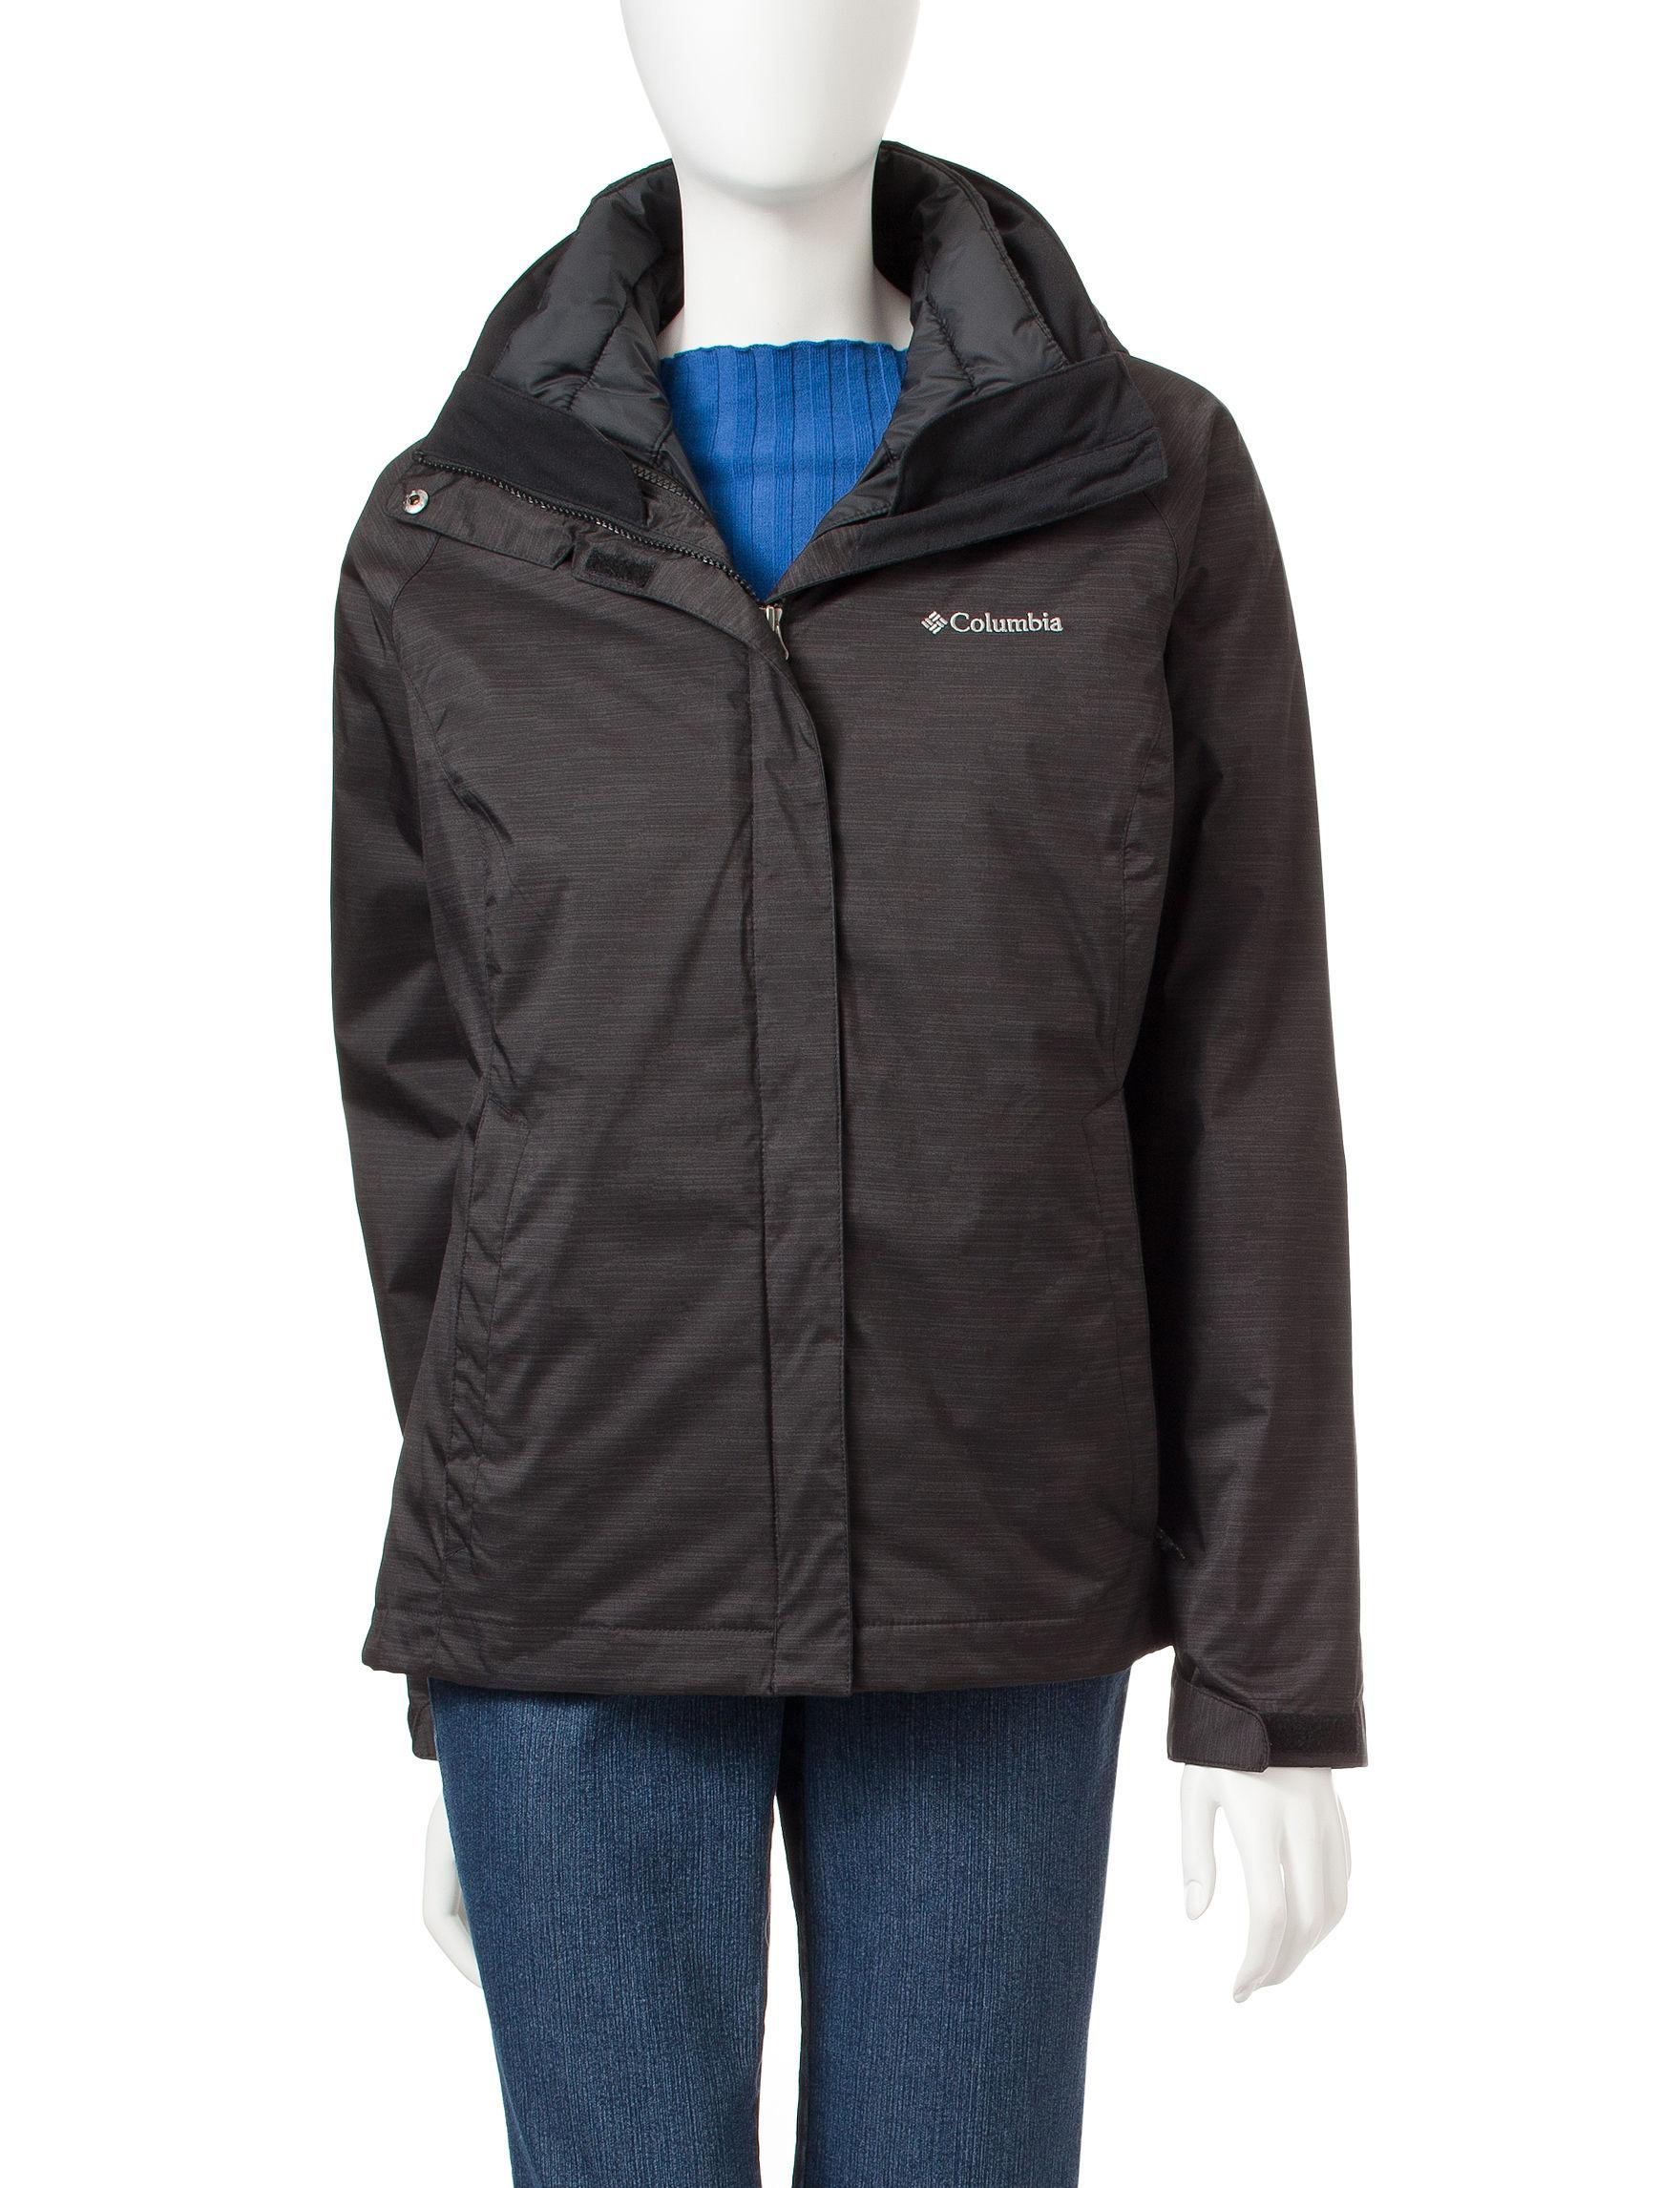 Columbia Grey Lightweight Jackets & Blazers